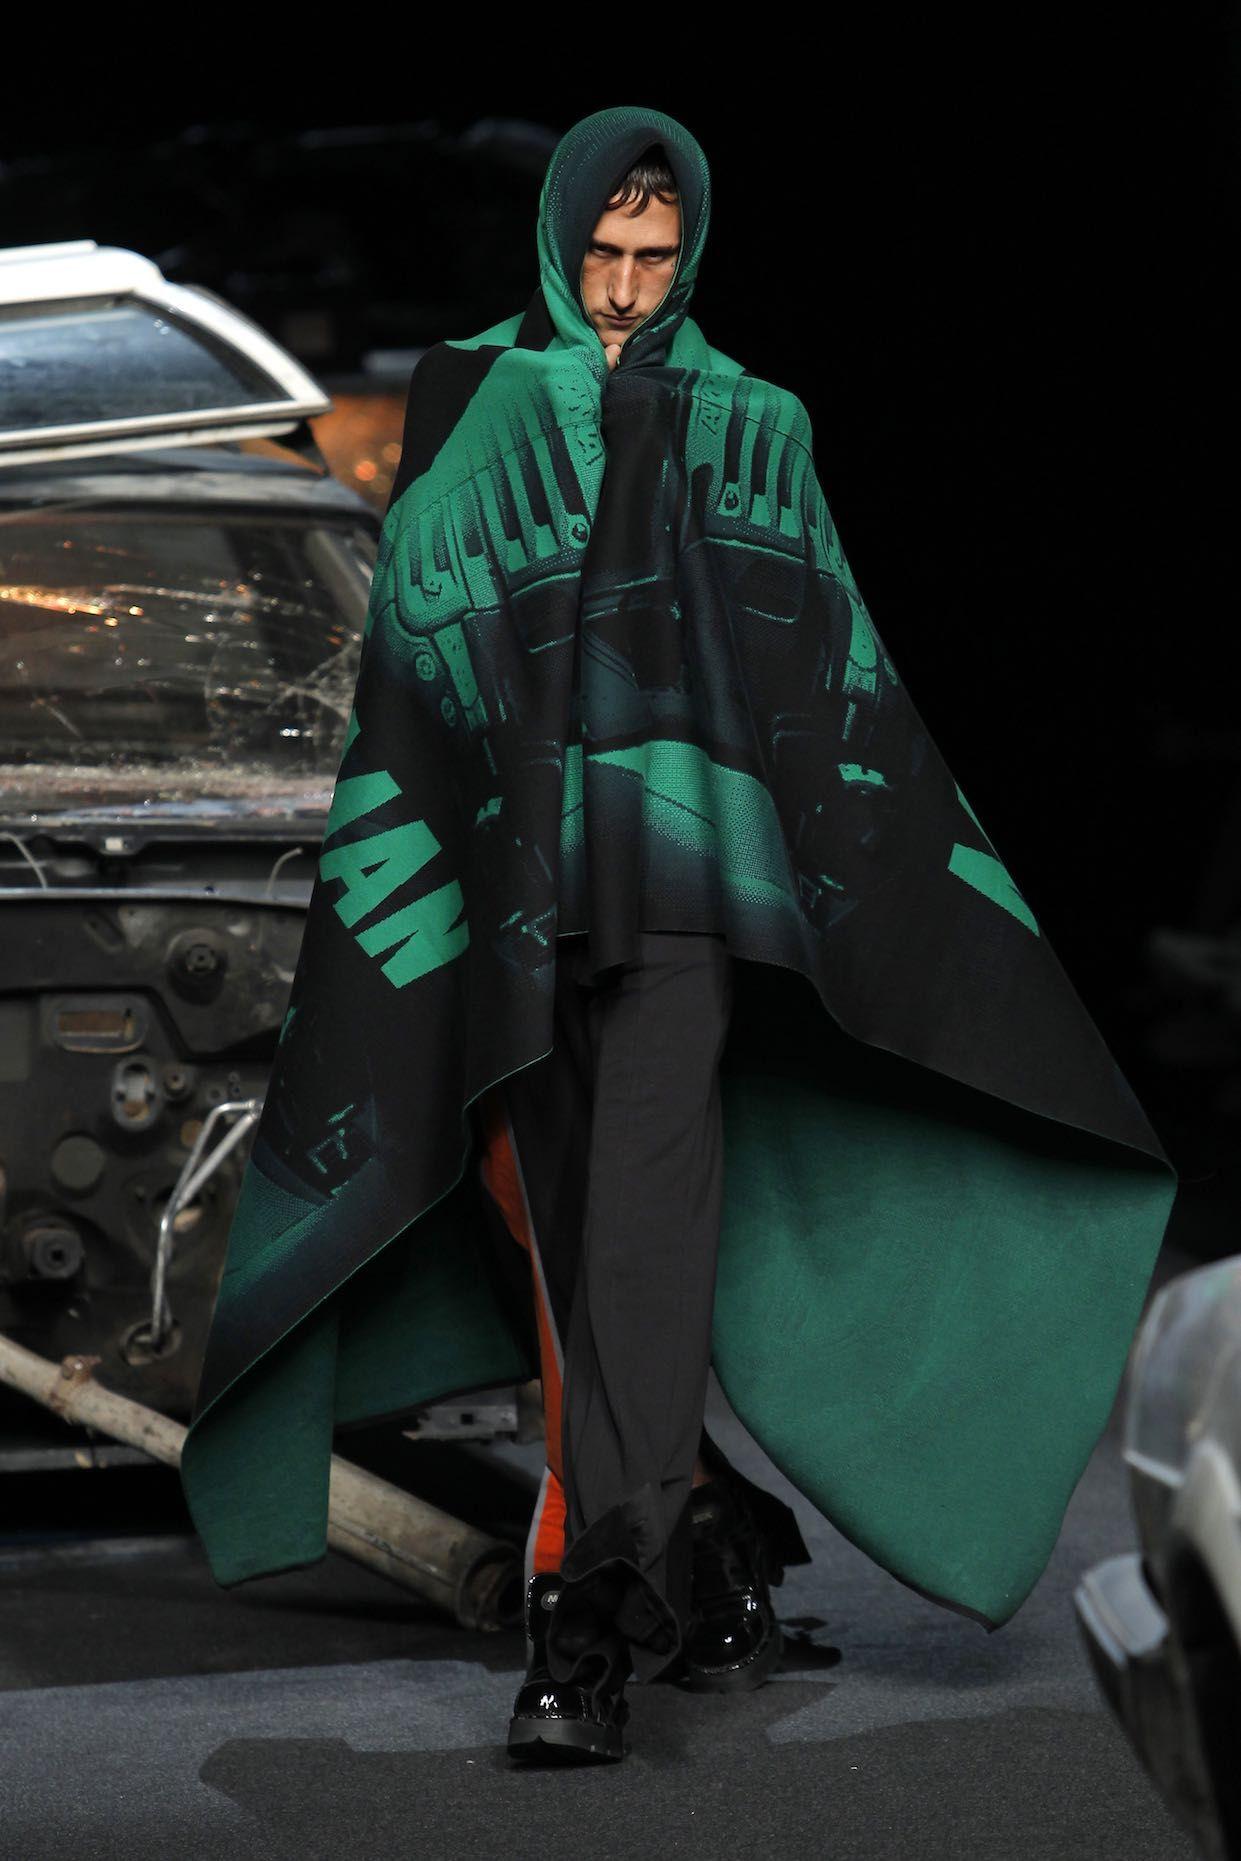 Frustrante auge Leche  Yung Beef x Maria Ke Fisherman | Fotos rap, Artistas, Álbumes musicales